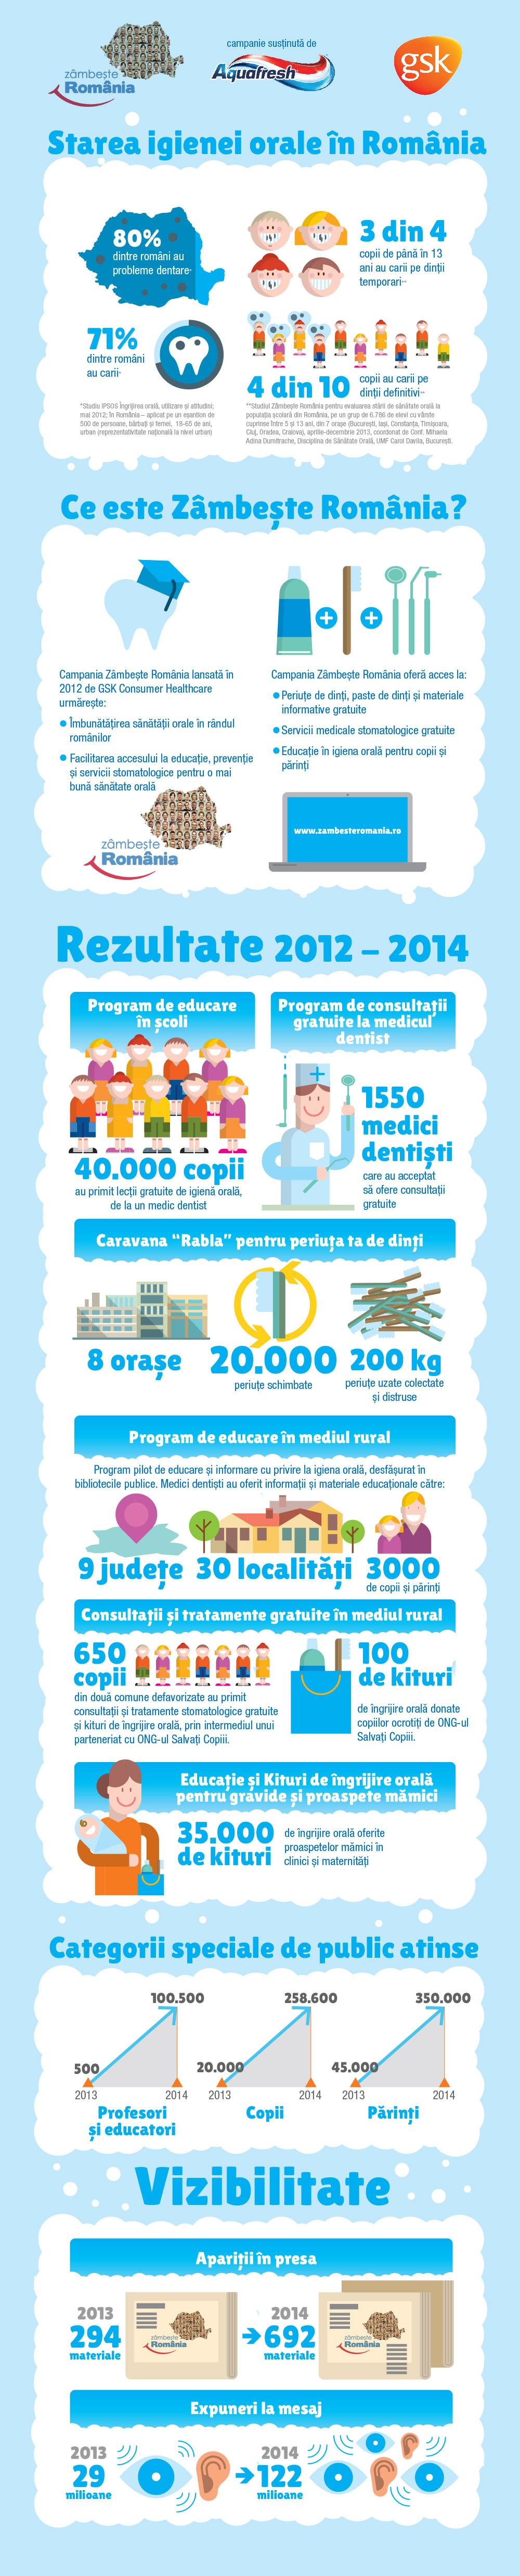 infografic-zambeste-romania_cu-rezultate